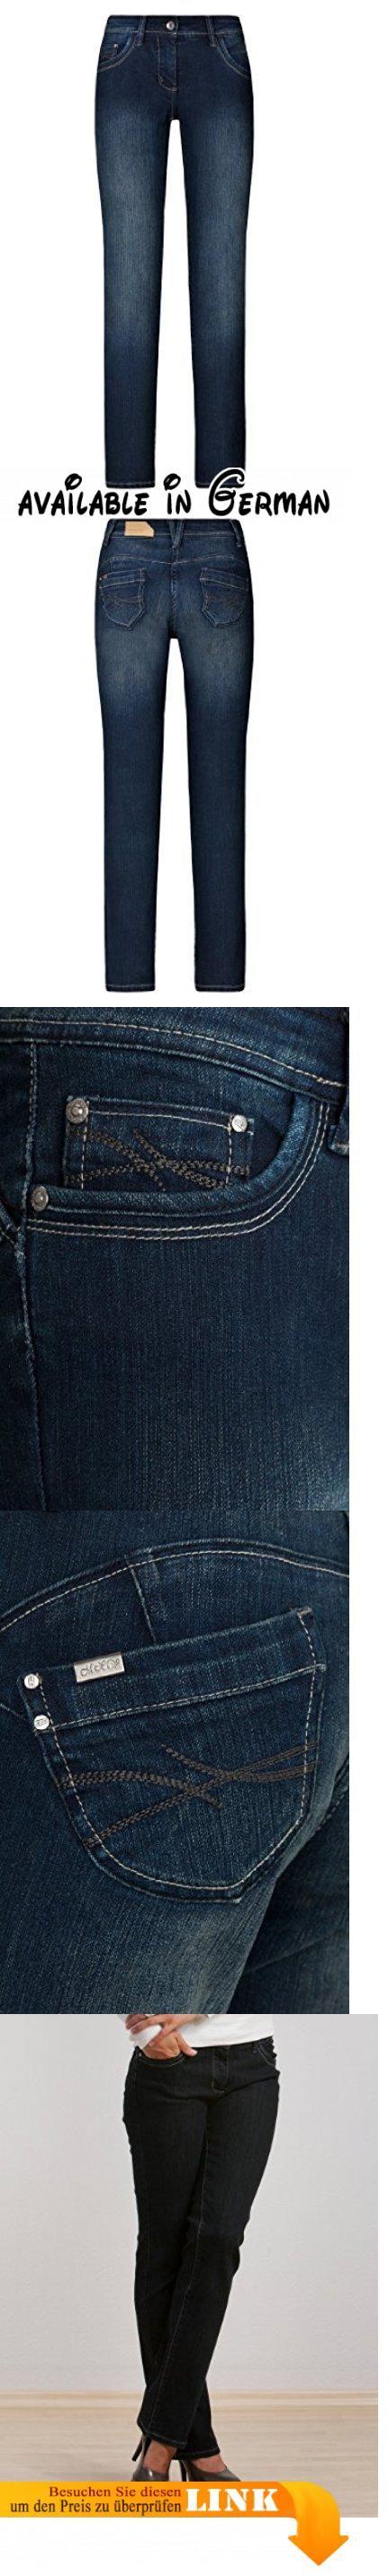 MillionX Damen Jeans Hose Victoria 'Bauch weg-push up' 8721125-902 dark blue, Farbe:902 dark blue;Größe:W38/L34. Material 78% Baumwolle, 20% Polyester, 2% Elastan #Apparel #PANTS